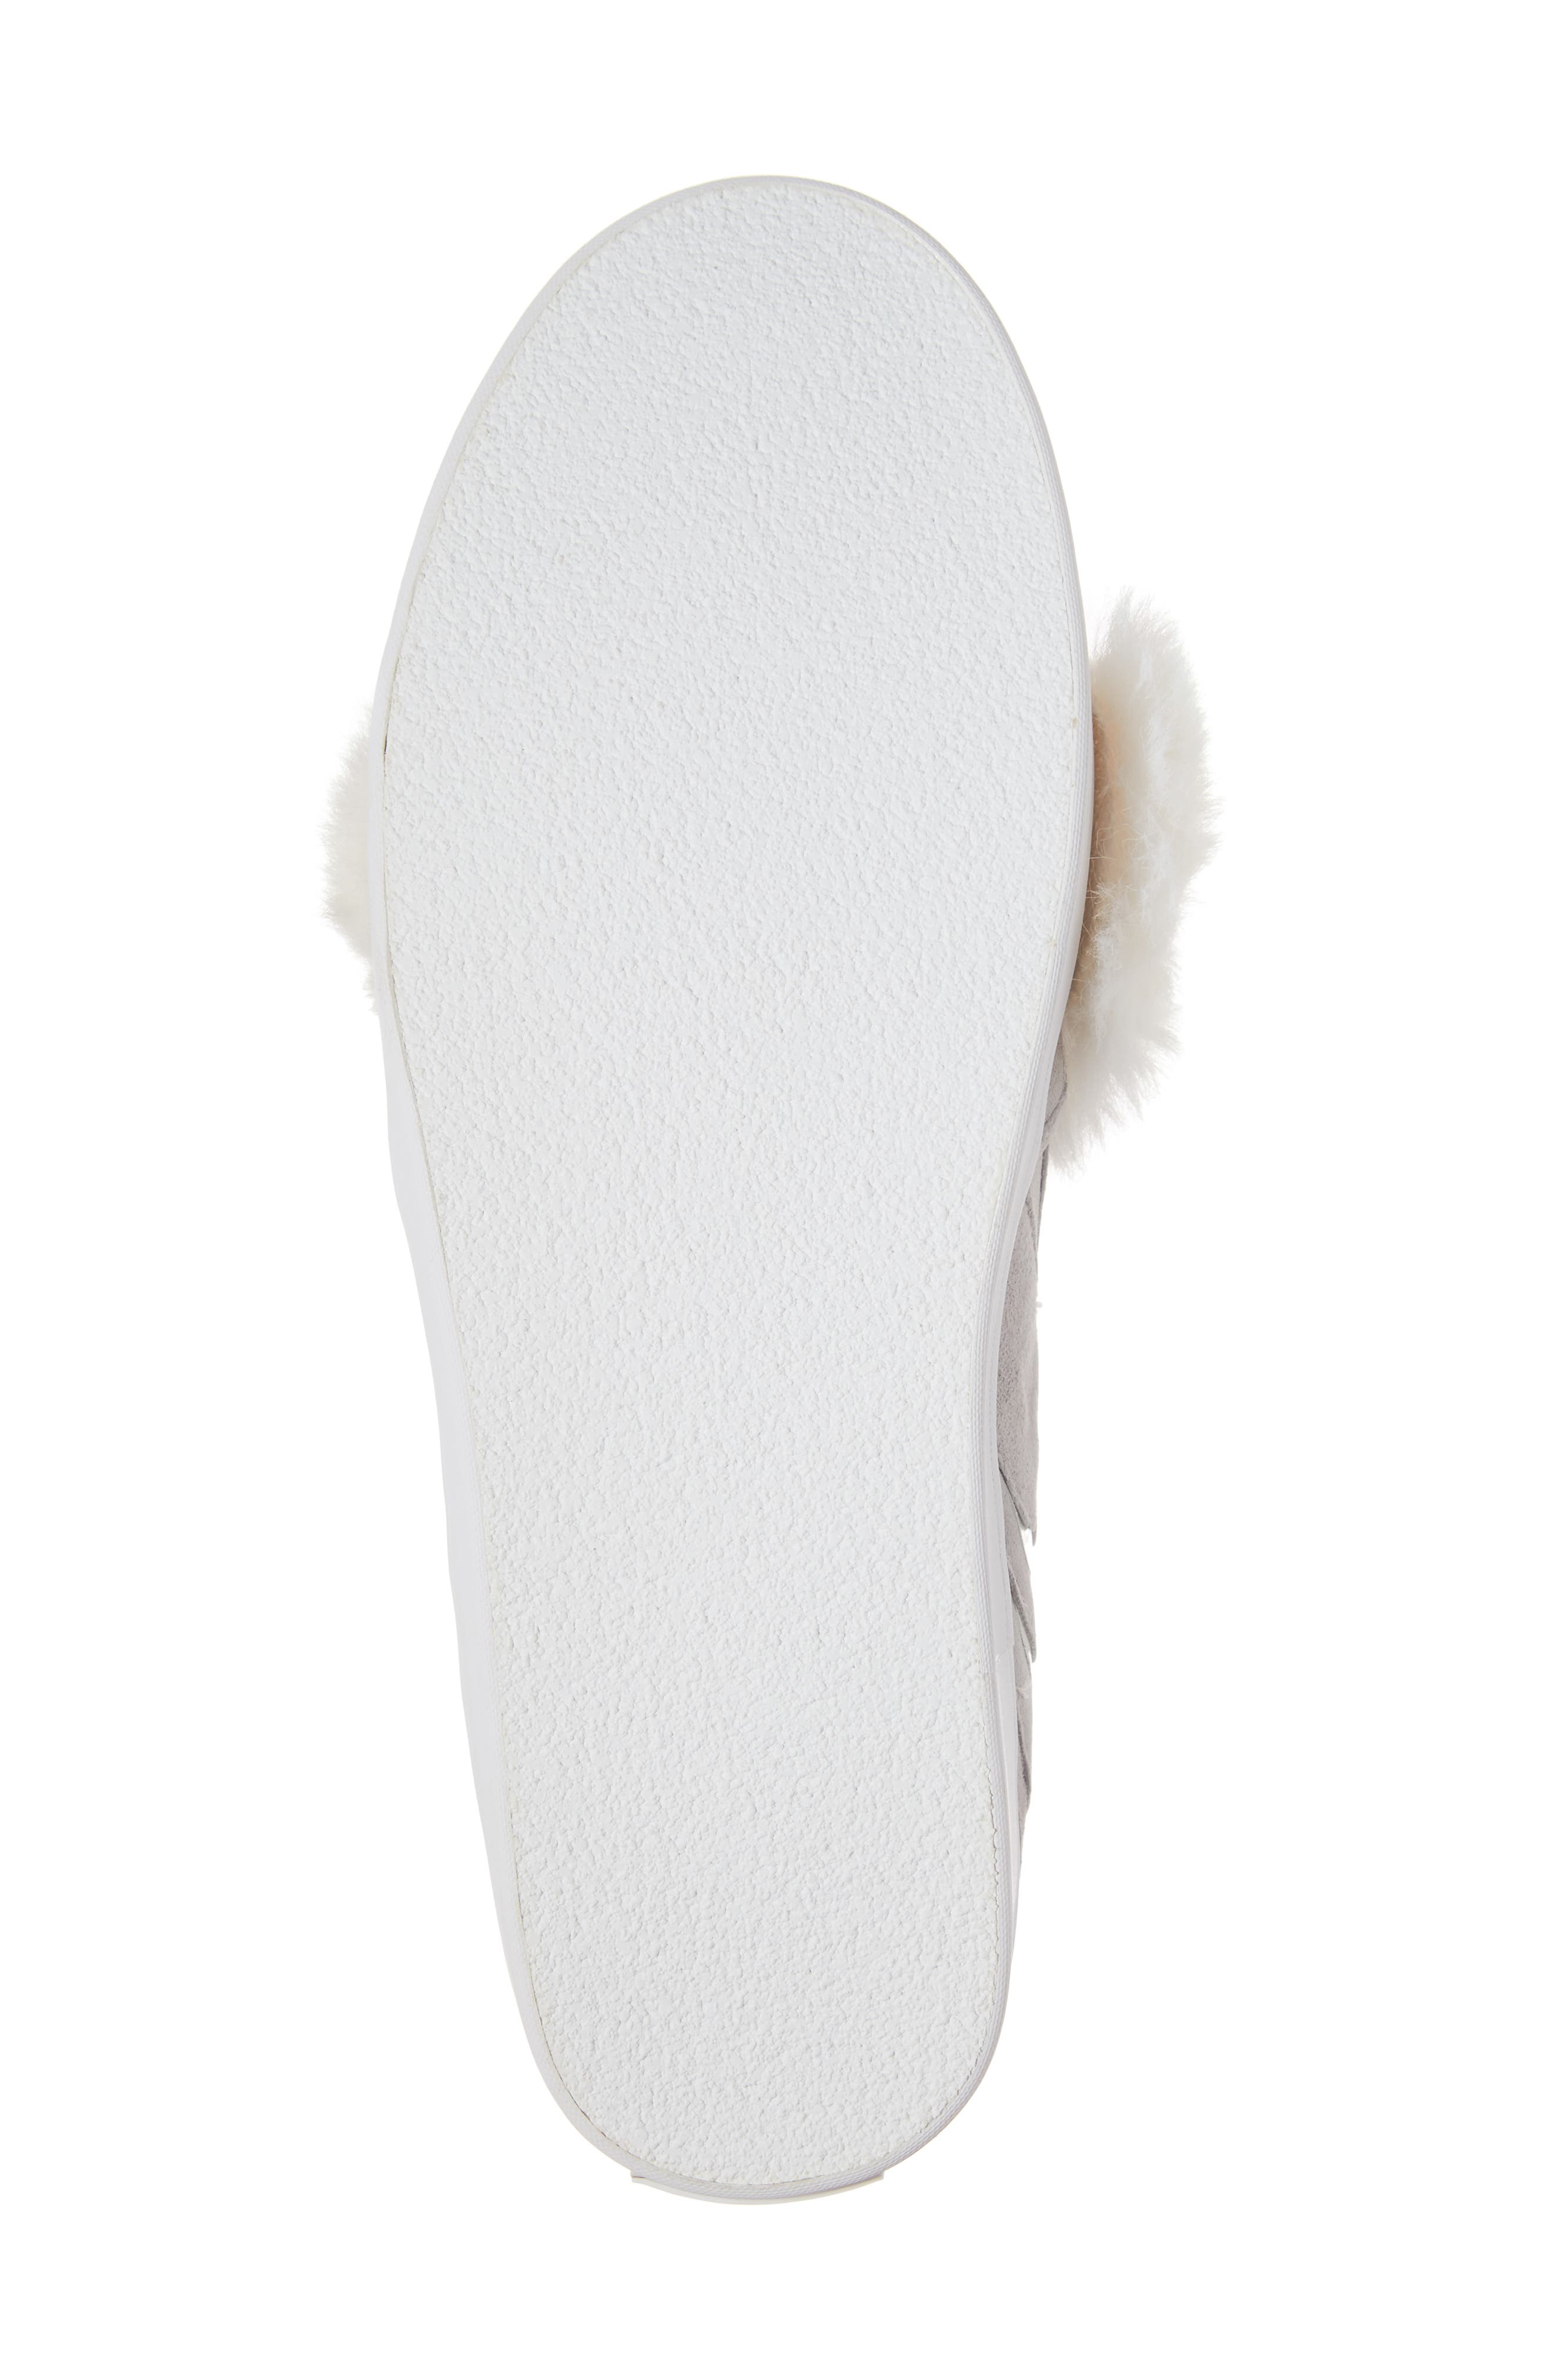 leferts faux fur trim slip-on sneaker,                             Alternate thumbnail 6, color,                             020